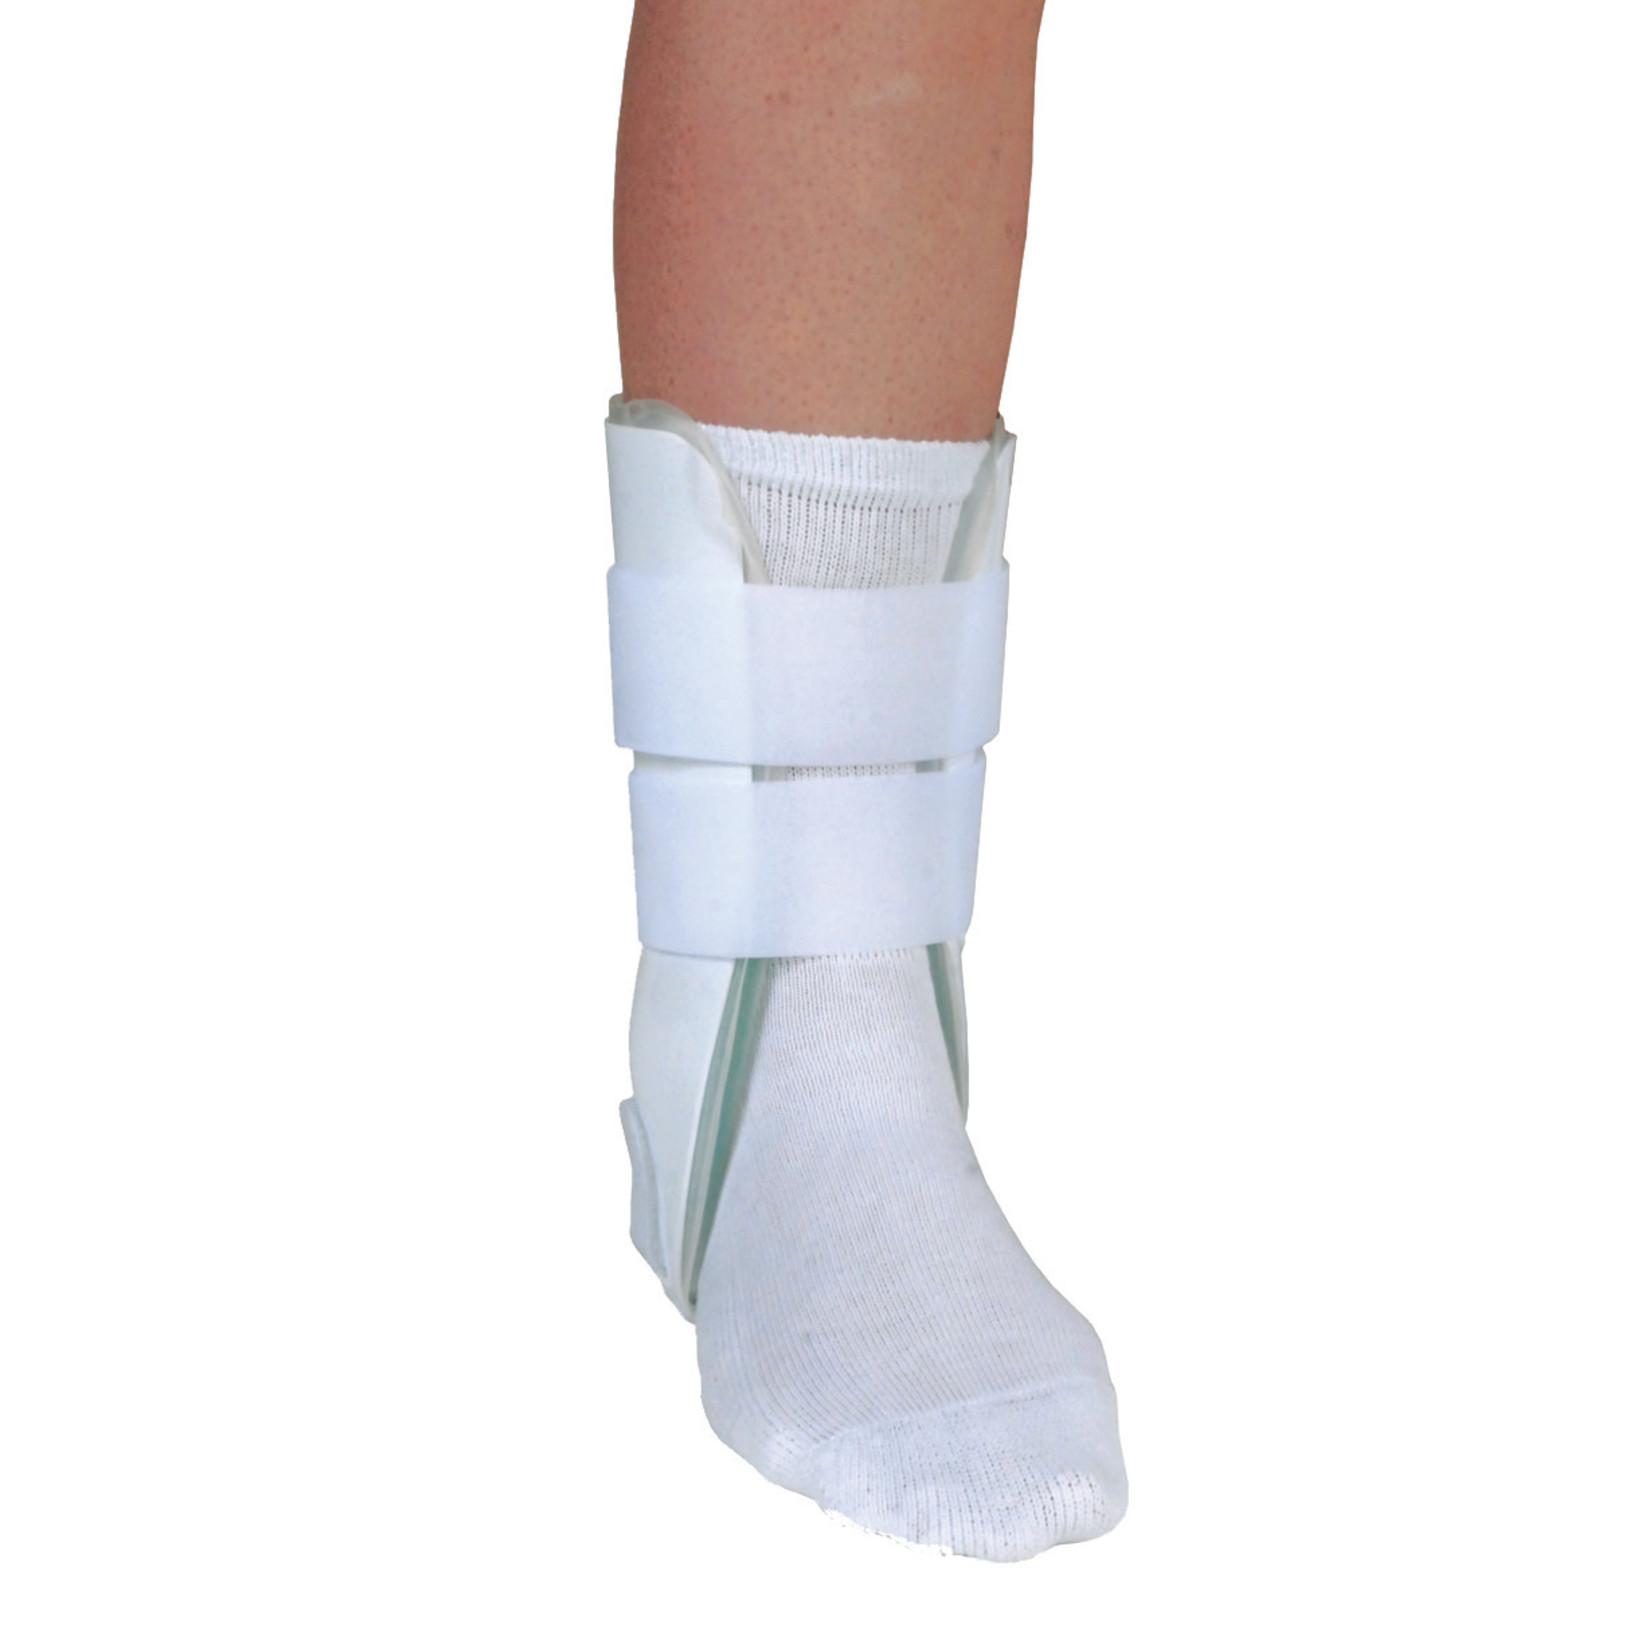 Hely & Weber Air Ankle Stirrup